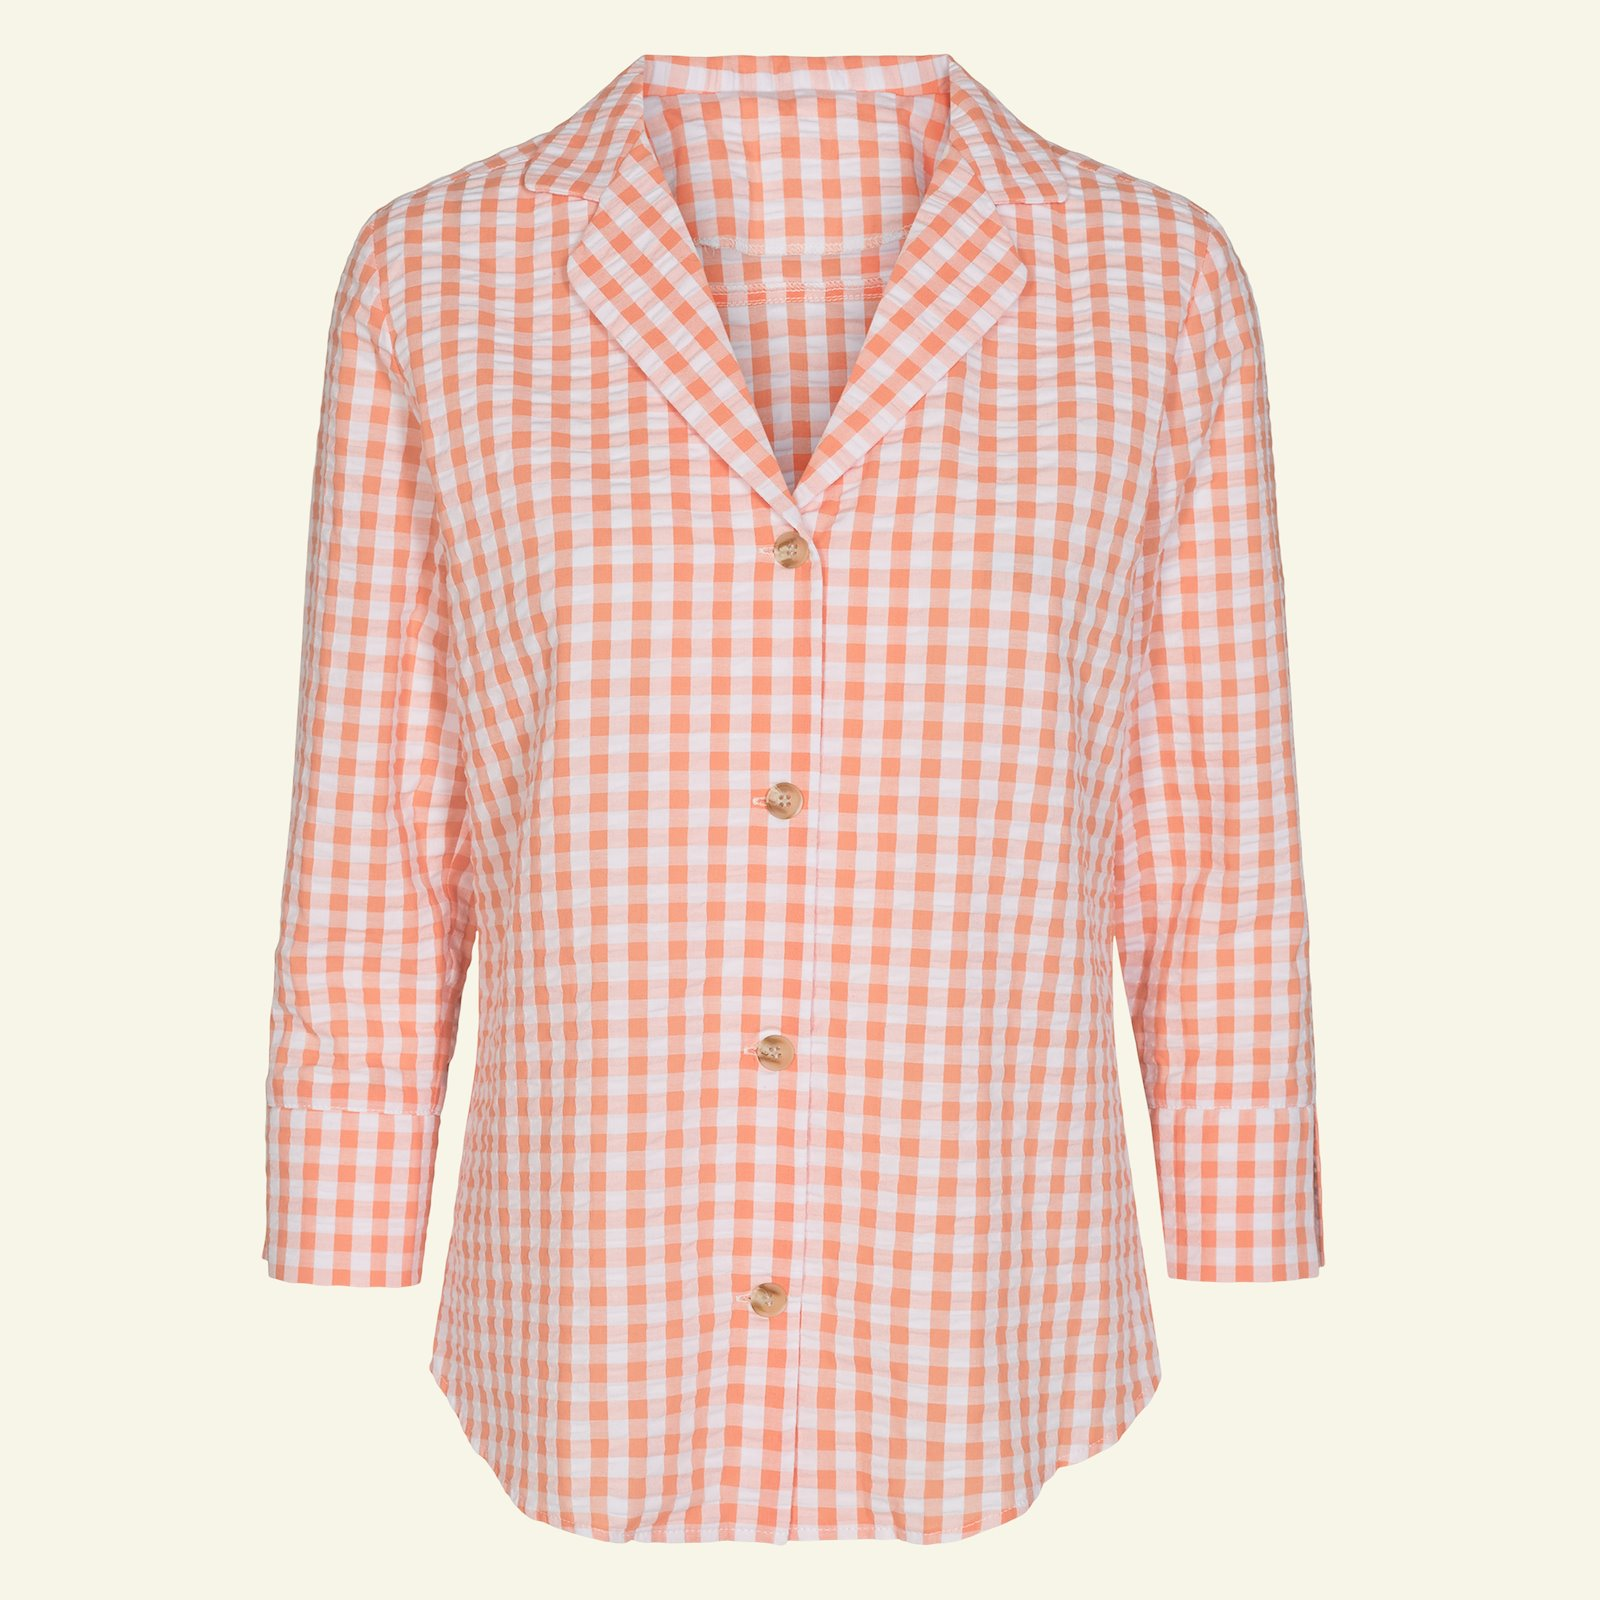 Shirt with ¾ sleeve length, 46/18 p22058_580047_40231_sskit